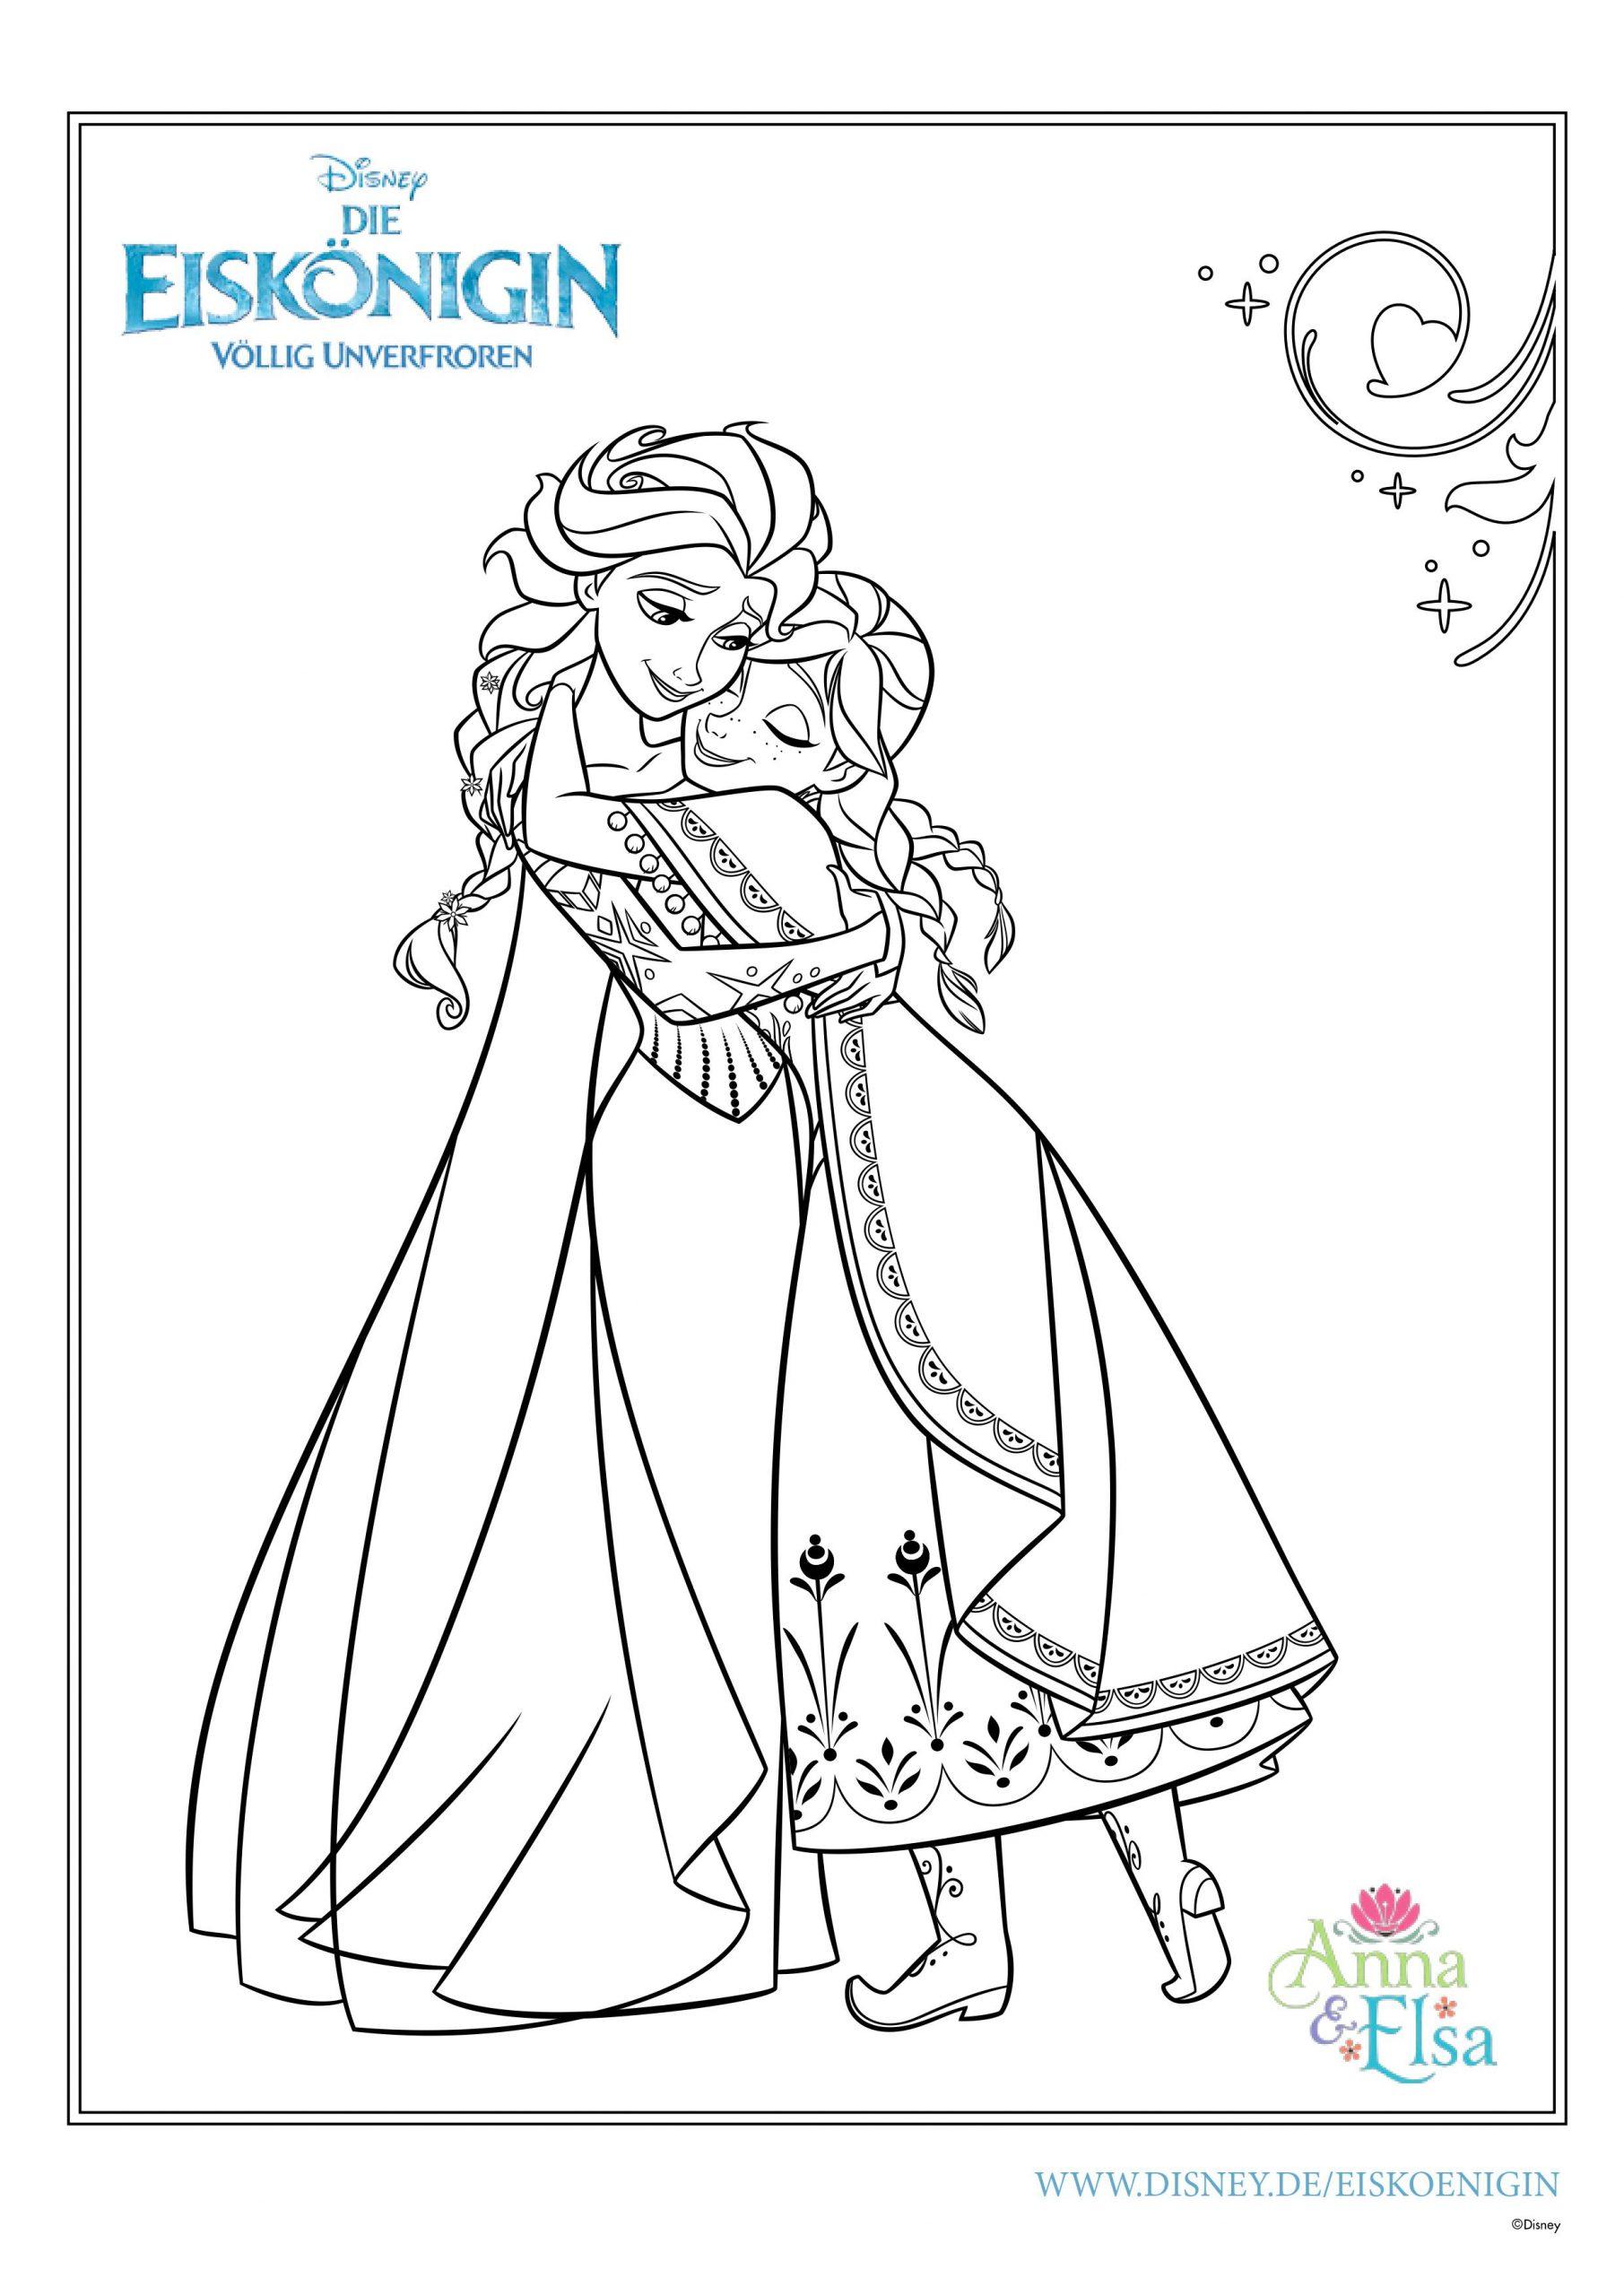 Ausmalbilder Eiskönigin | Mytoys-Blog innen Anna Und Elsa Ausmalbilder